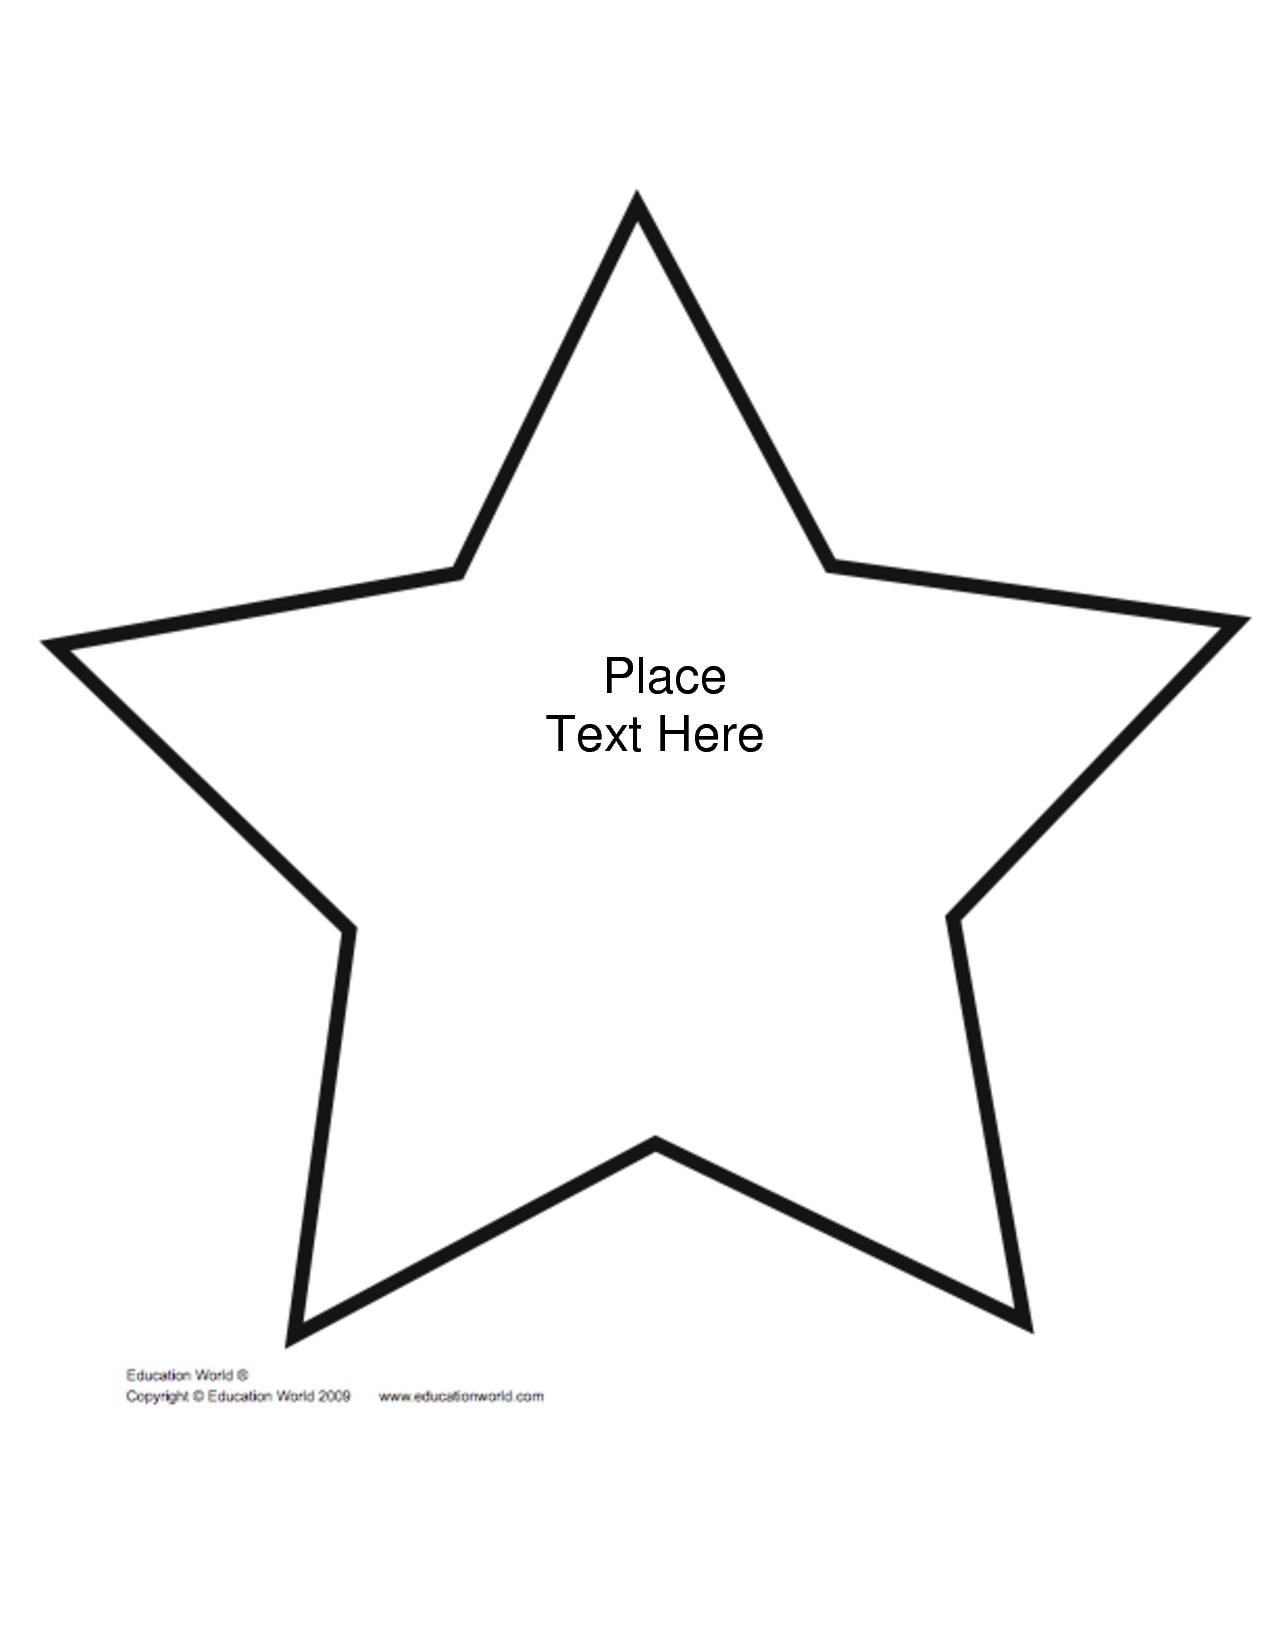 Free+Printable+Star+Shape+Templates   Biblical Preschool Lessons - Star Of David Template Free Printable